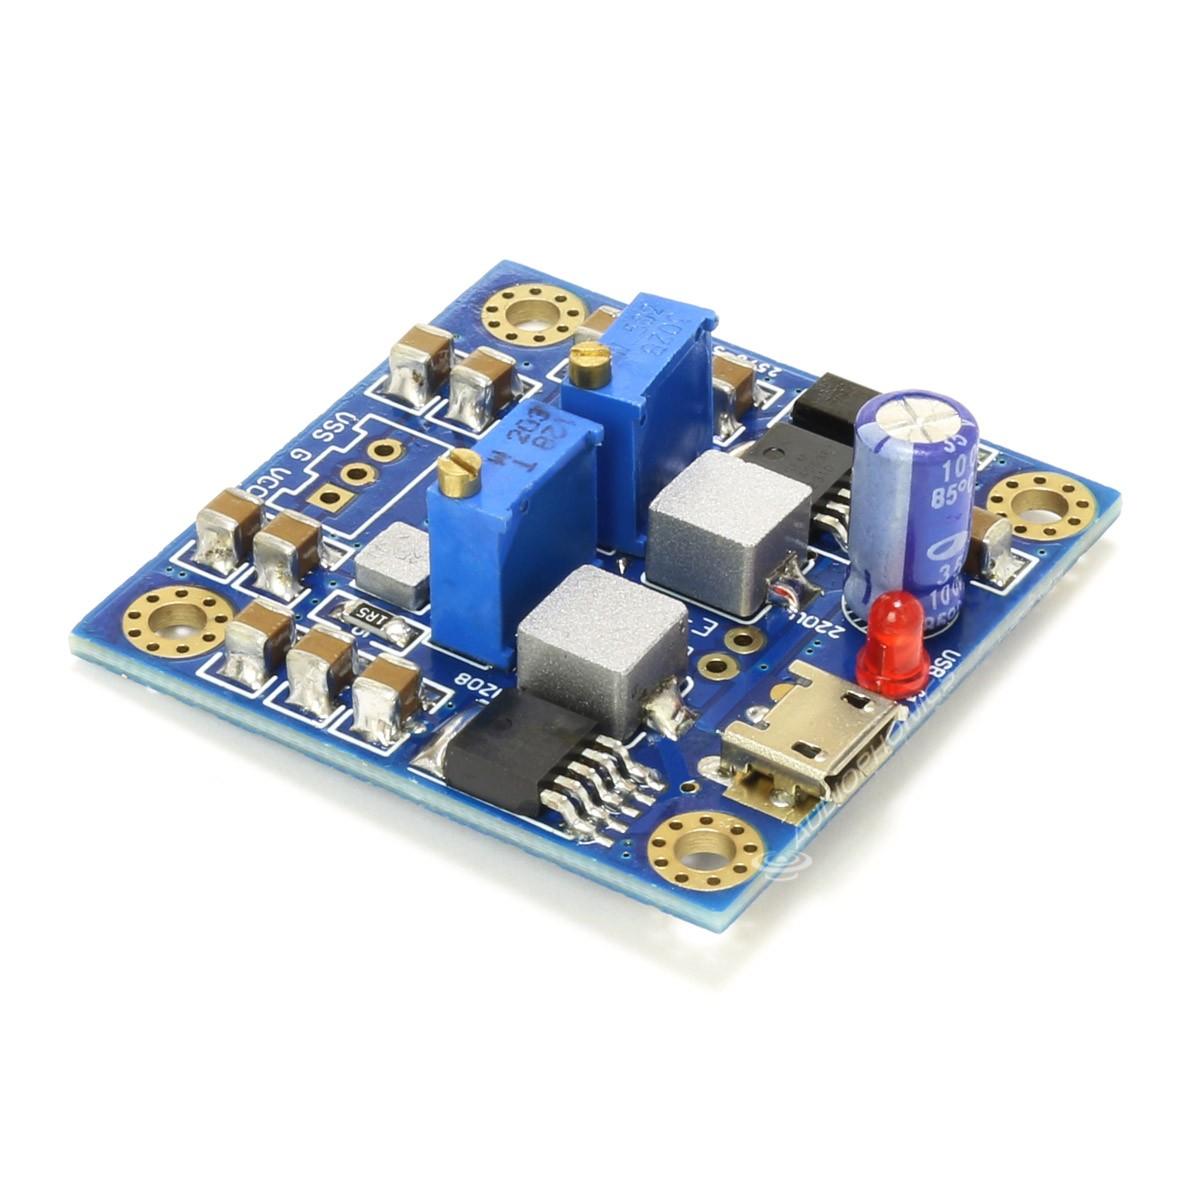 Power Supply DC-DC Converter Module 4-12V DC to +/-8 to +/-18V DC 1.5A